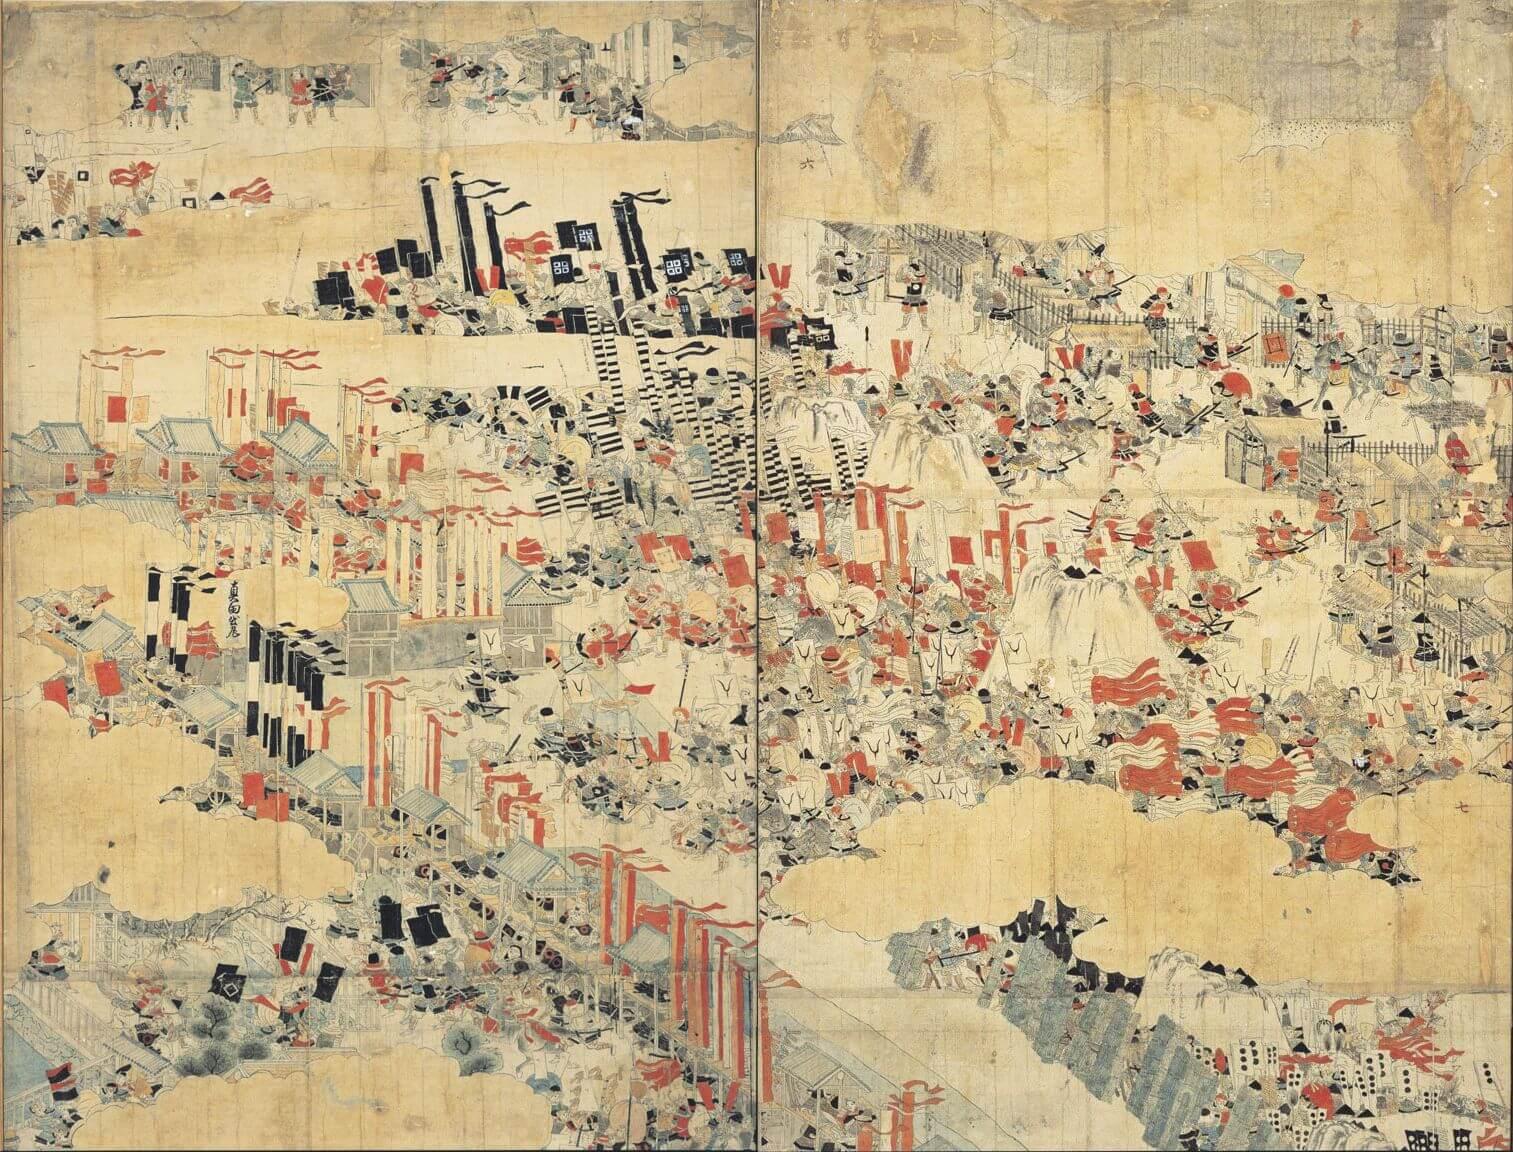 大阪冬の陣図屏風の真田丸攻防